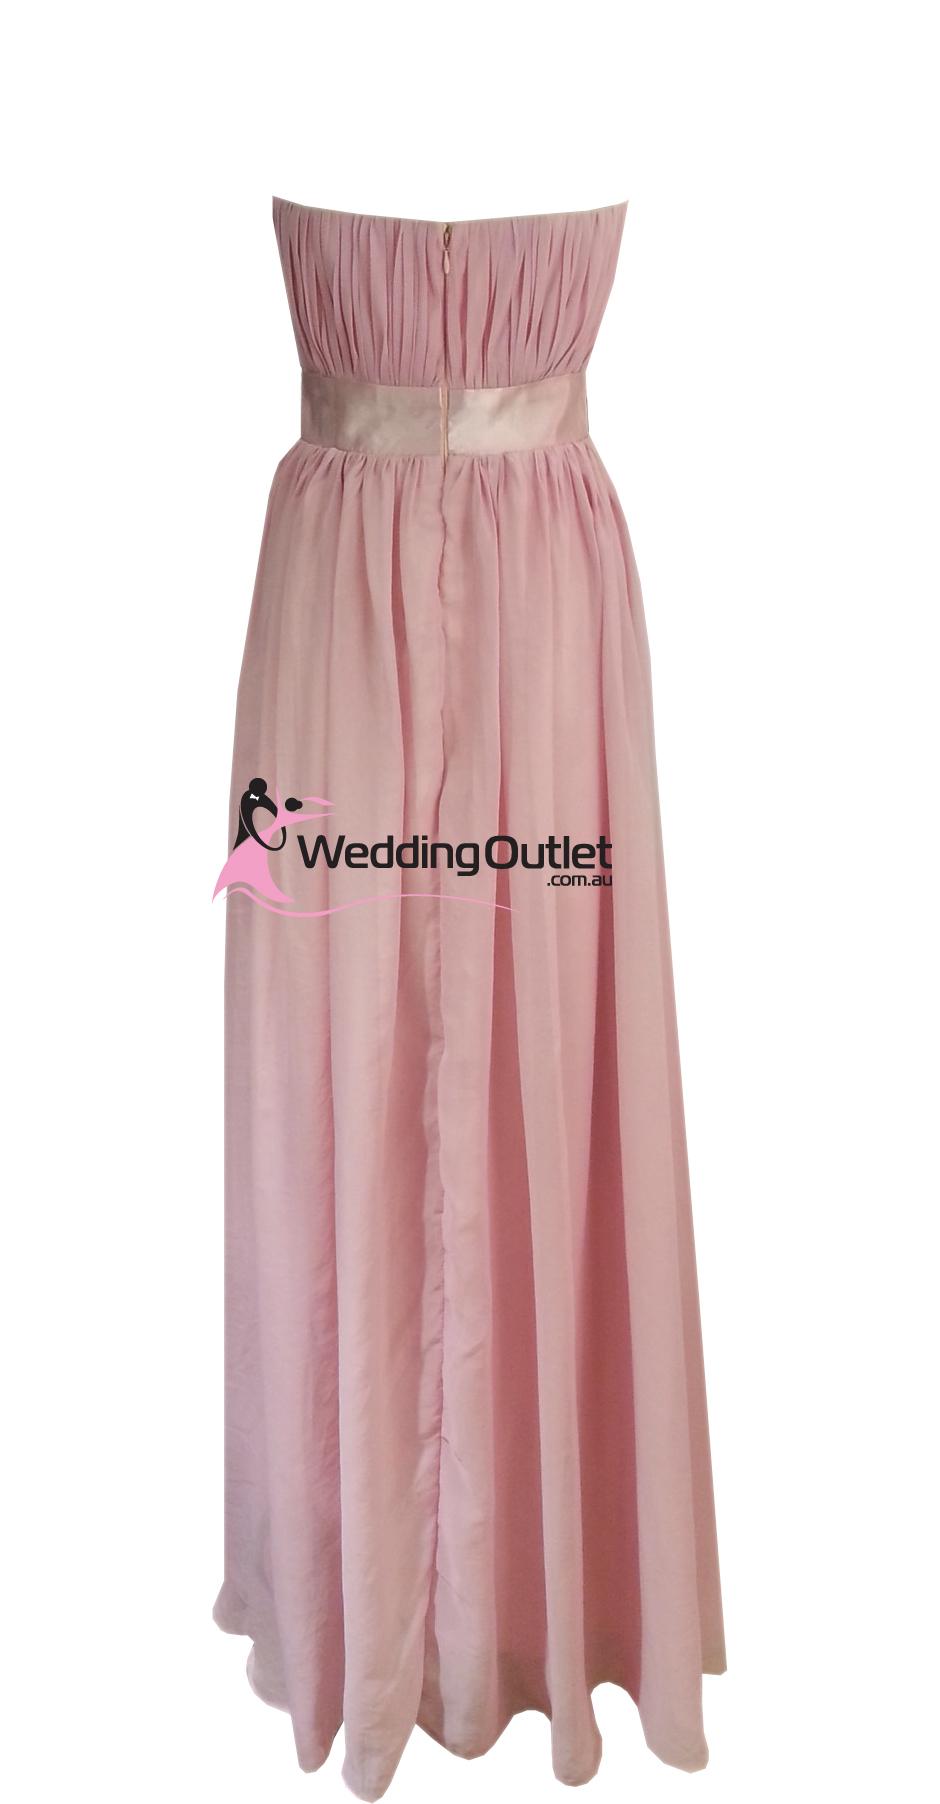 Dusty Pink Strapless Bridesmaid Dresses Style #V101 - WeddingOutlet ...